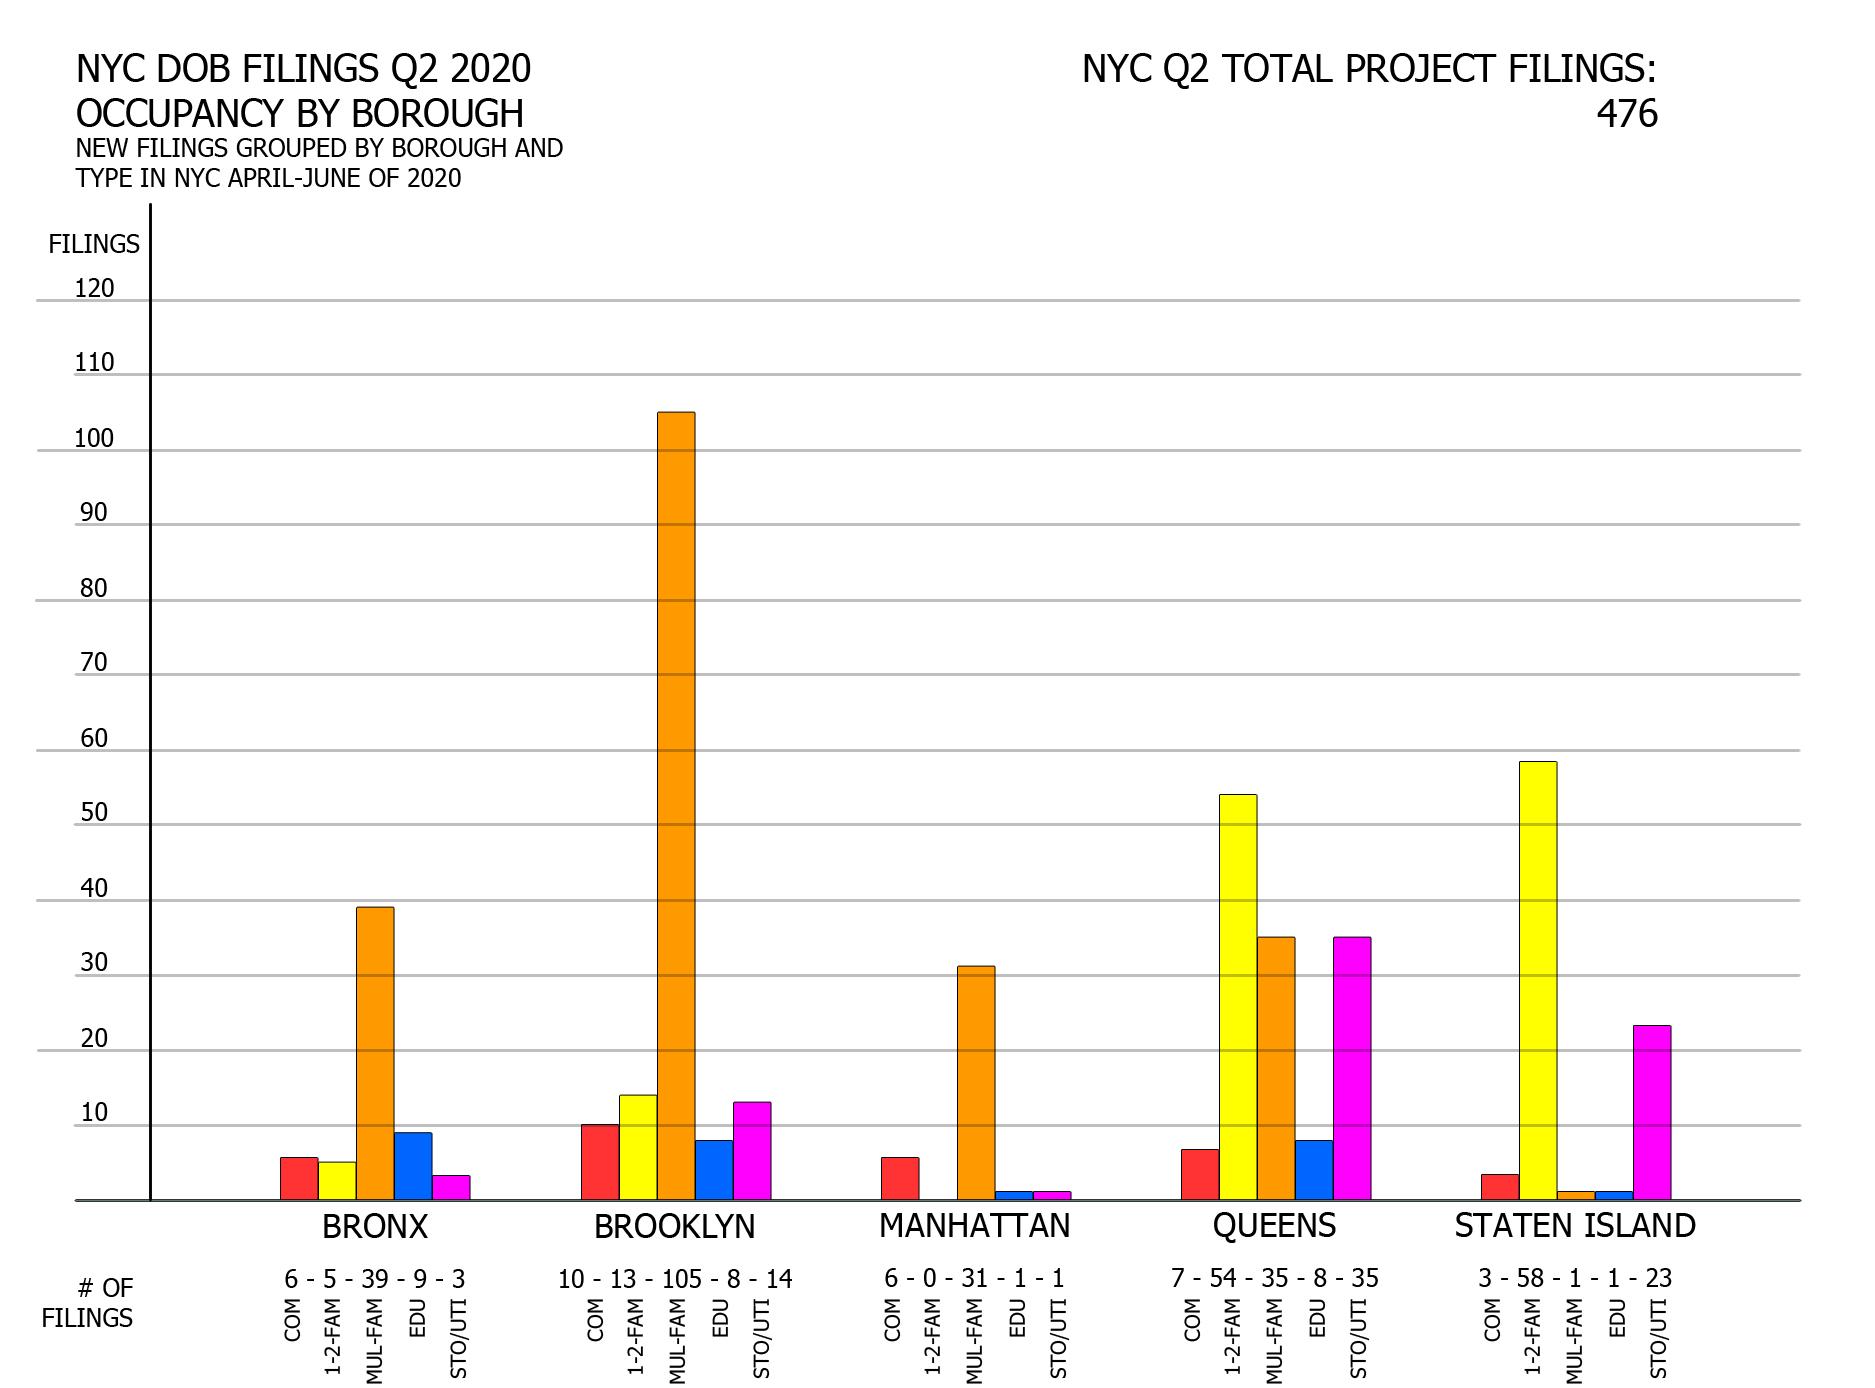 NYC Q2 2020 filings - Filings by borough and occupancy. Image credit: Vitali Ogorodnikov